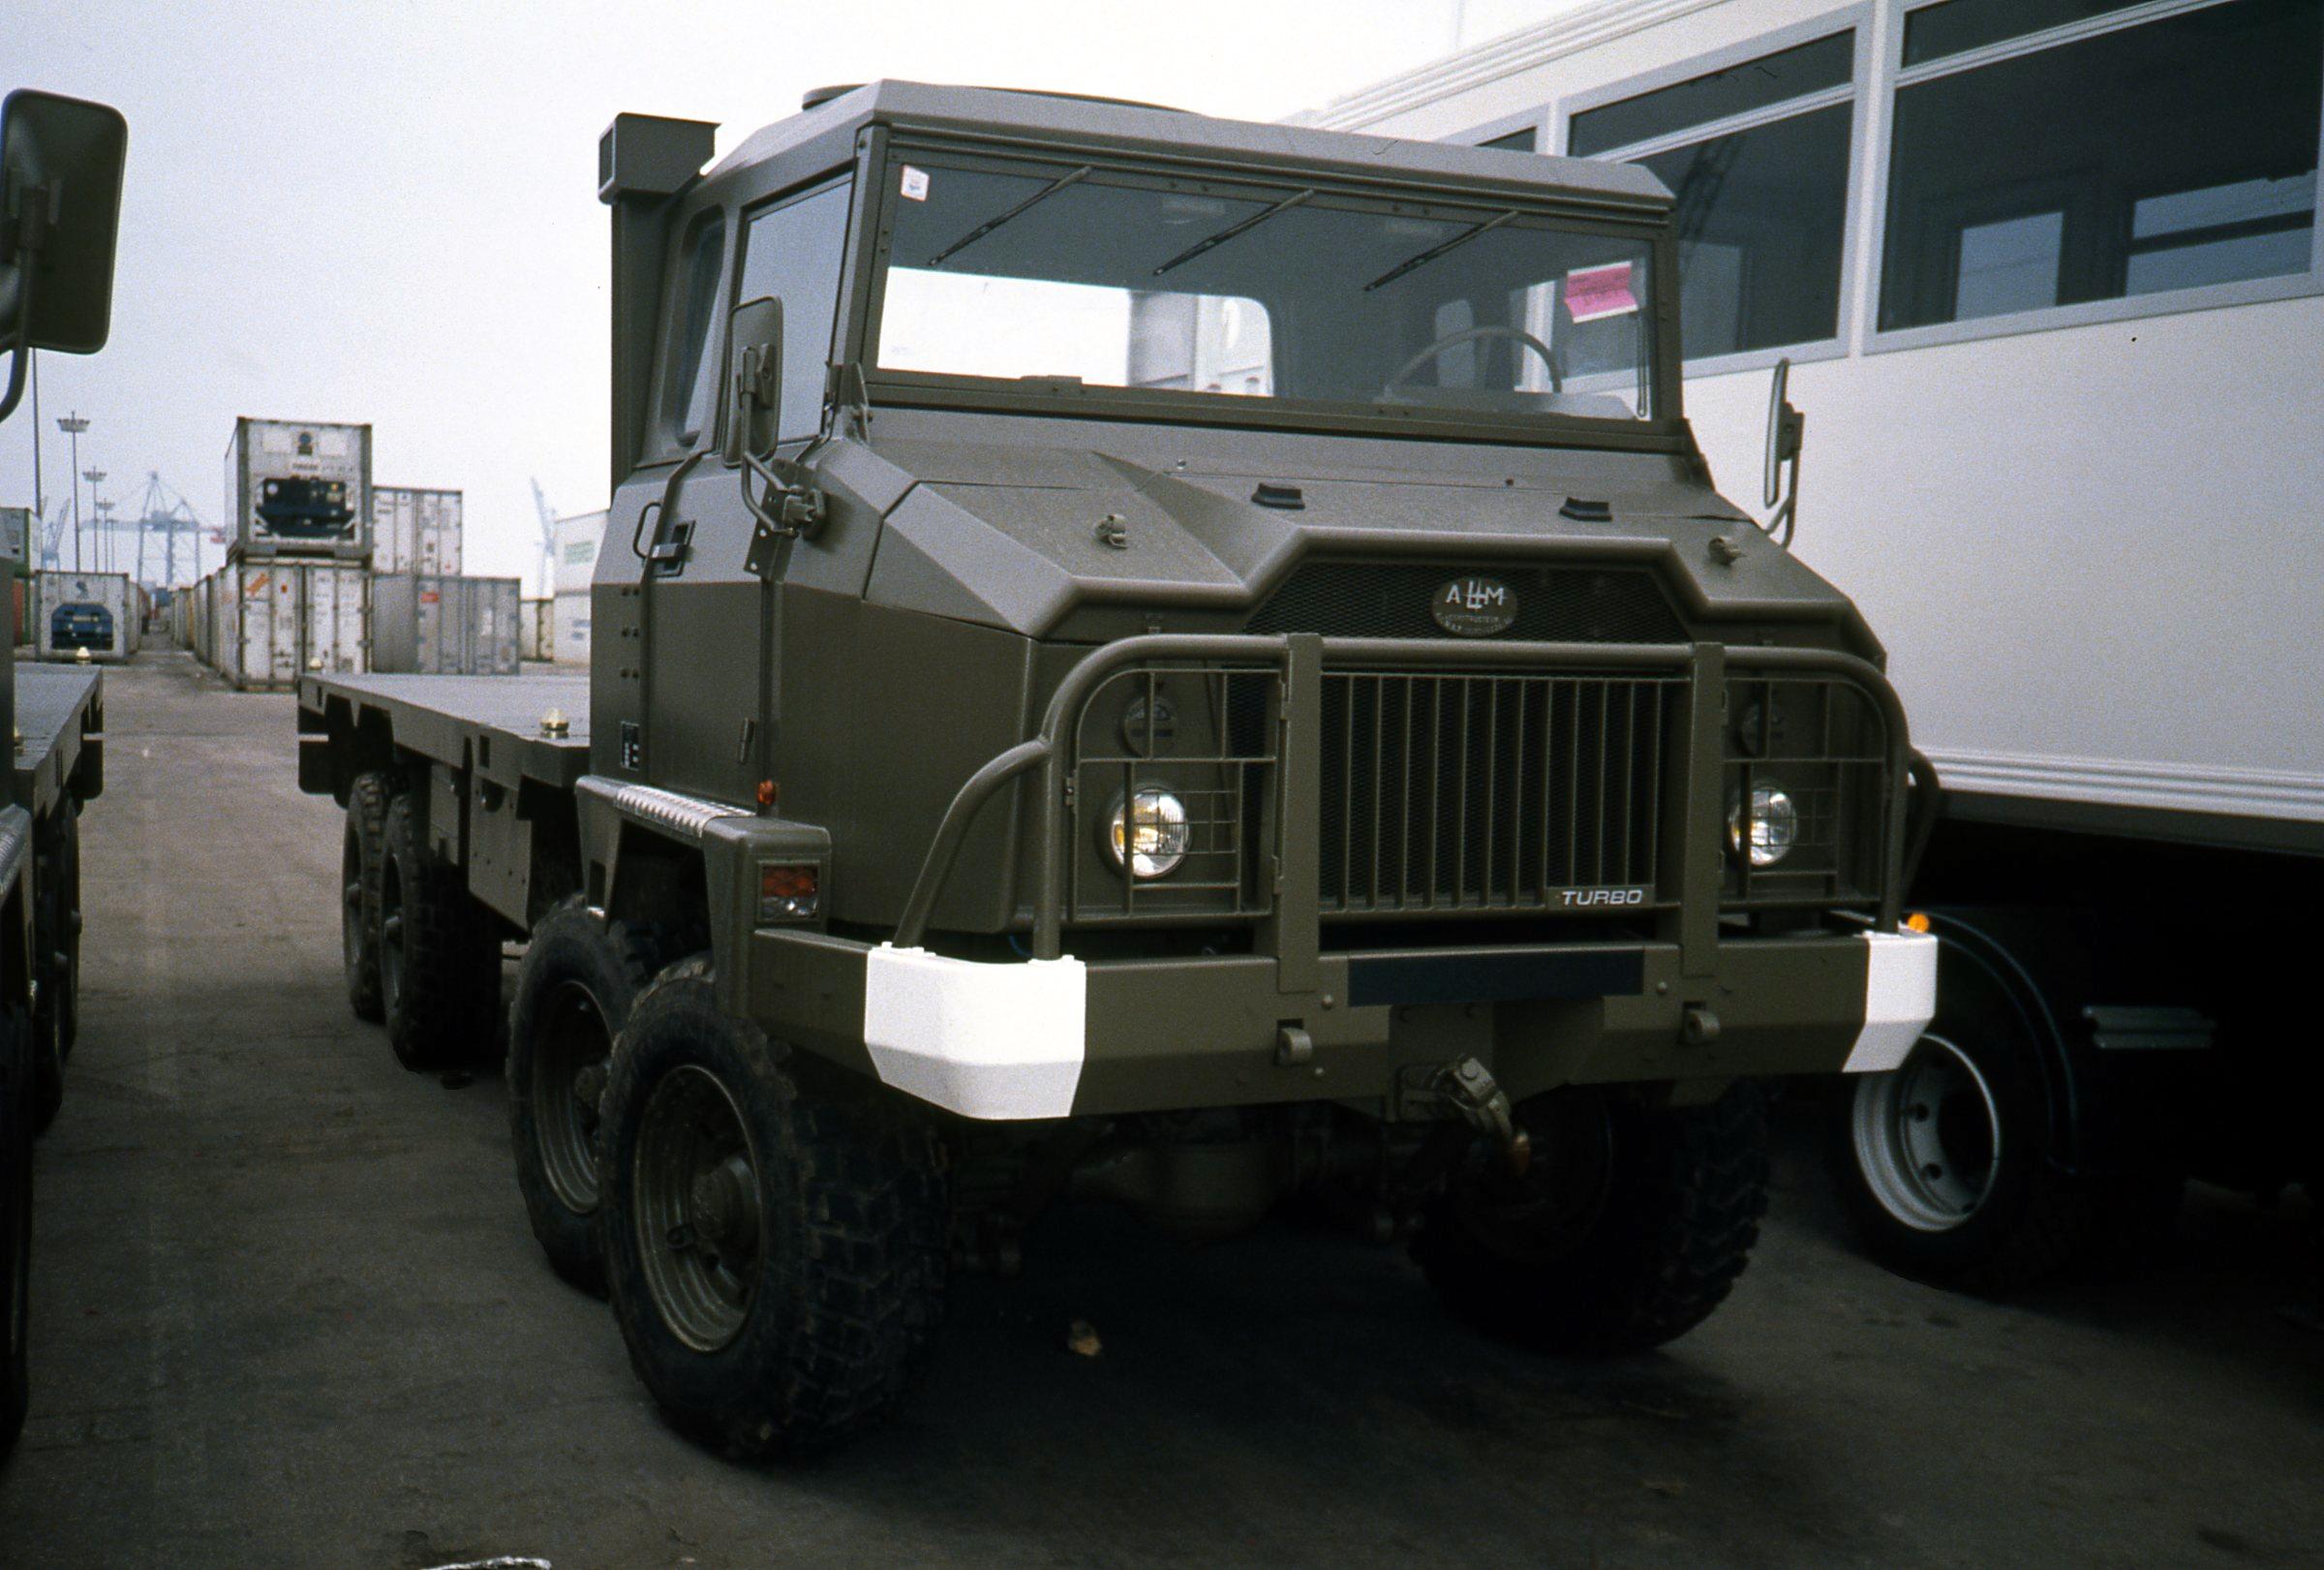 Photos - Logistique et Camions / Logistics and Trucks - Page 6 34519837850_81f381a4ea_o